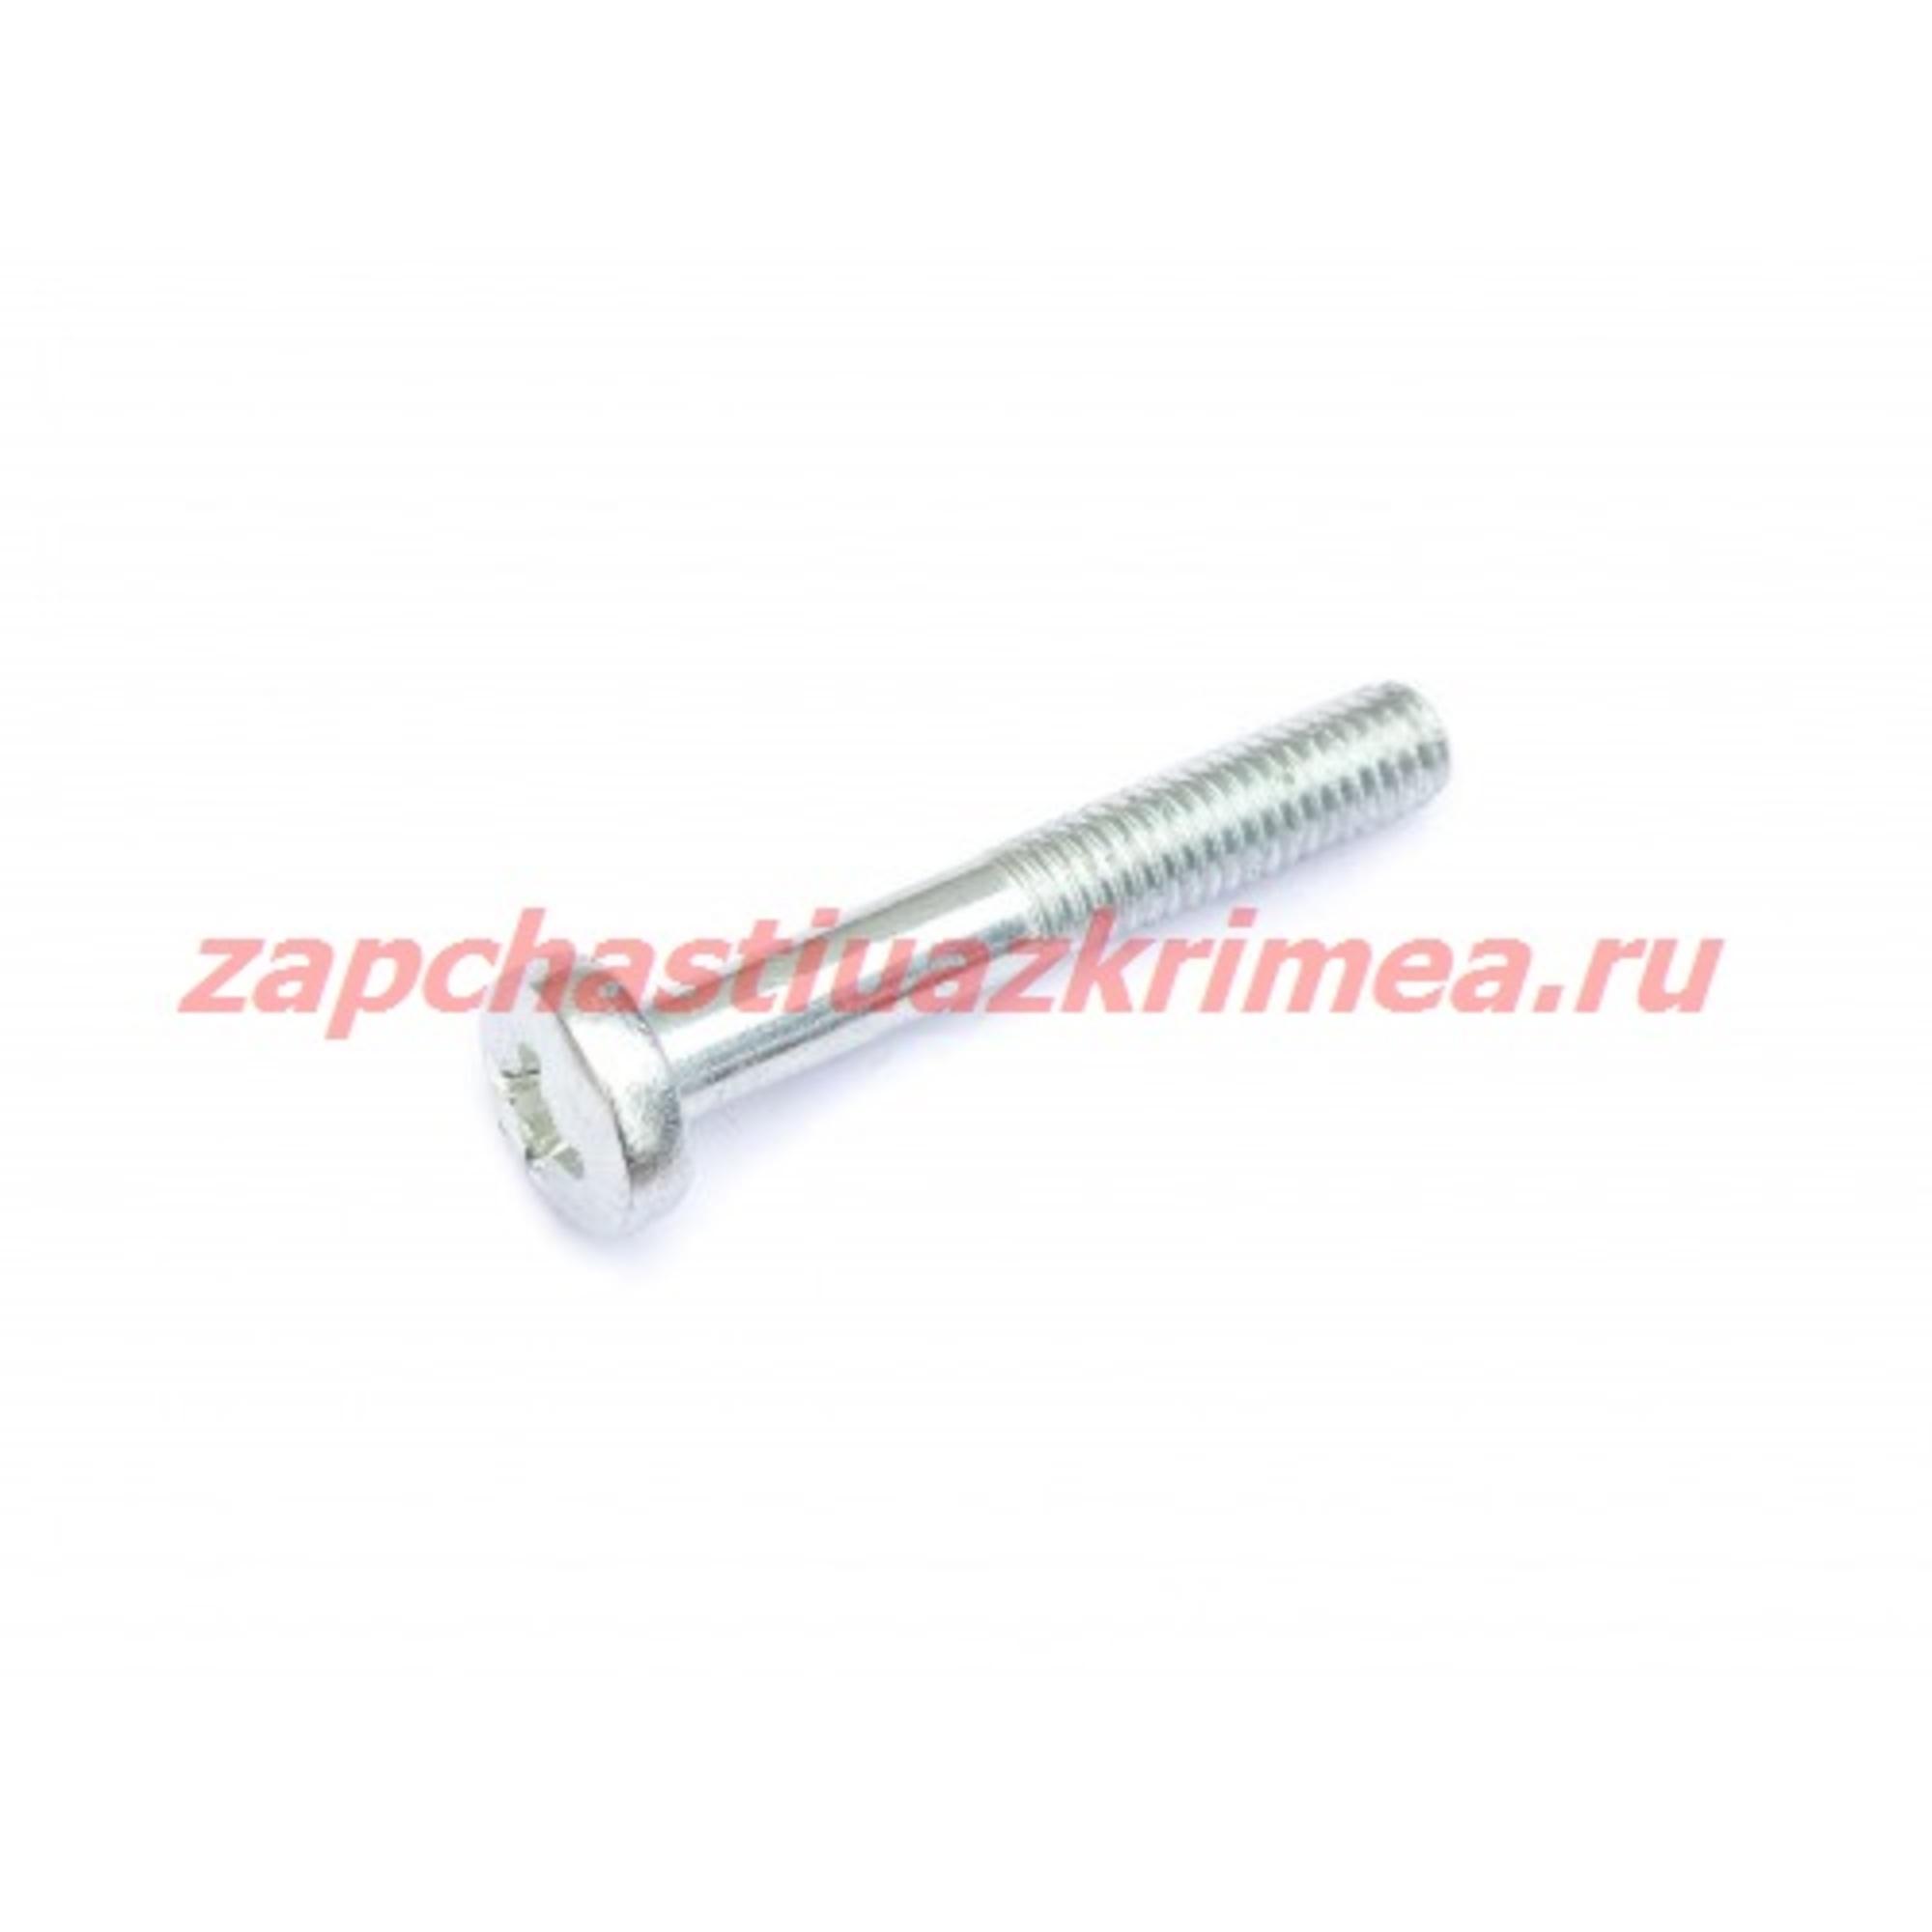 Винт М6х40 крепления колпака колеса УАЗ (завод)